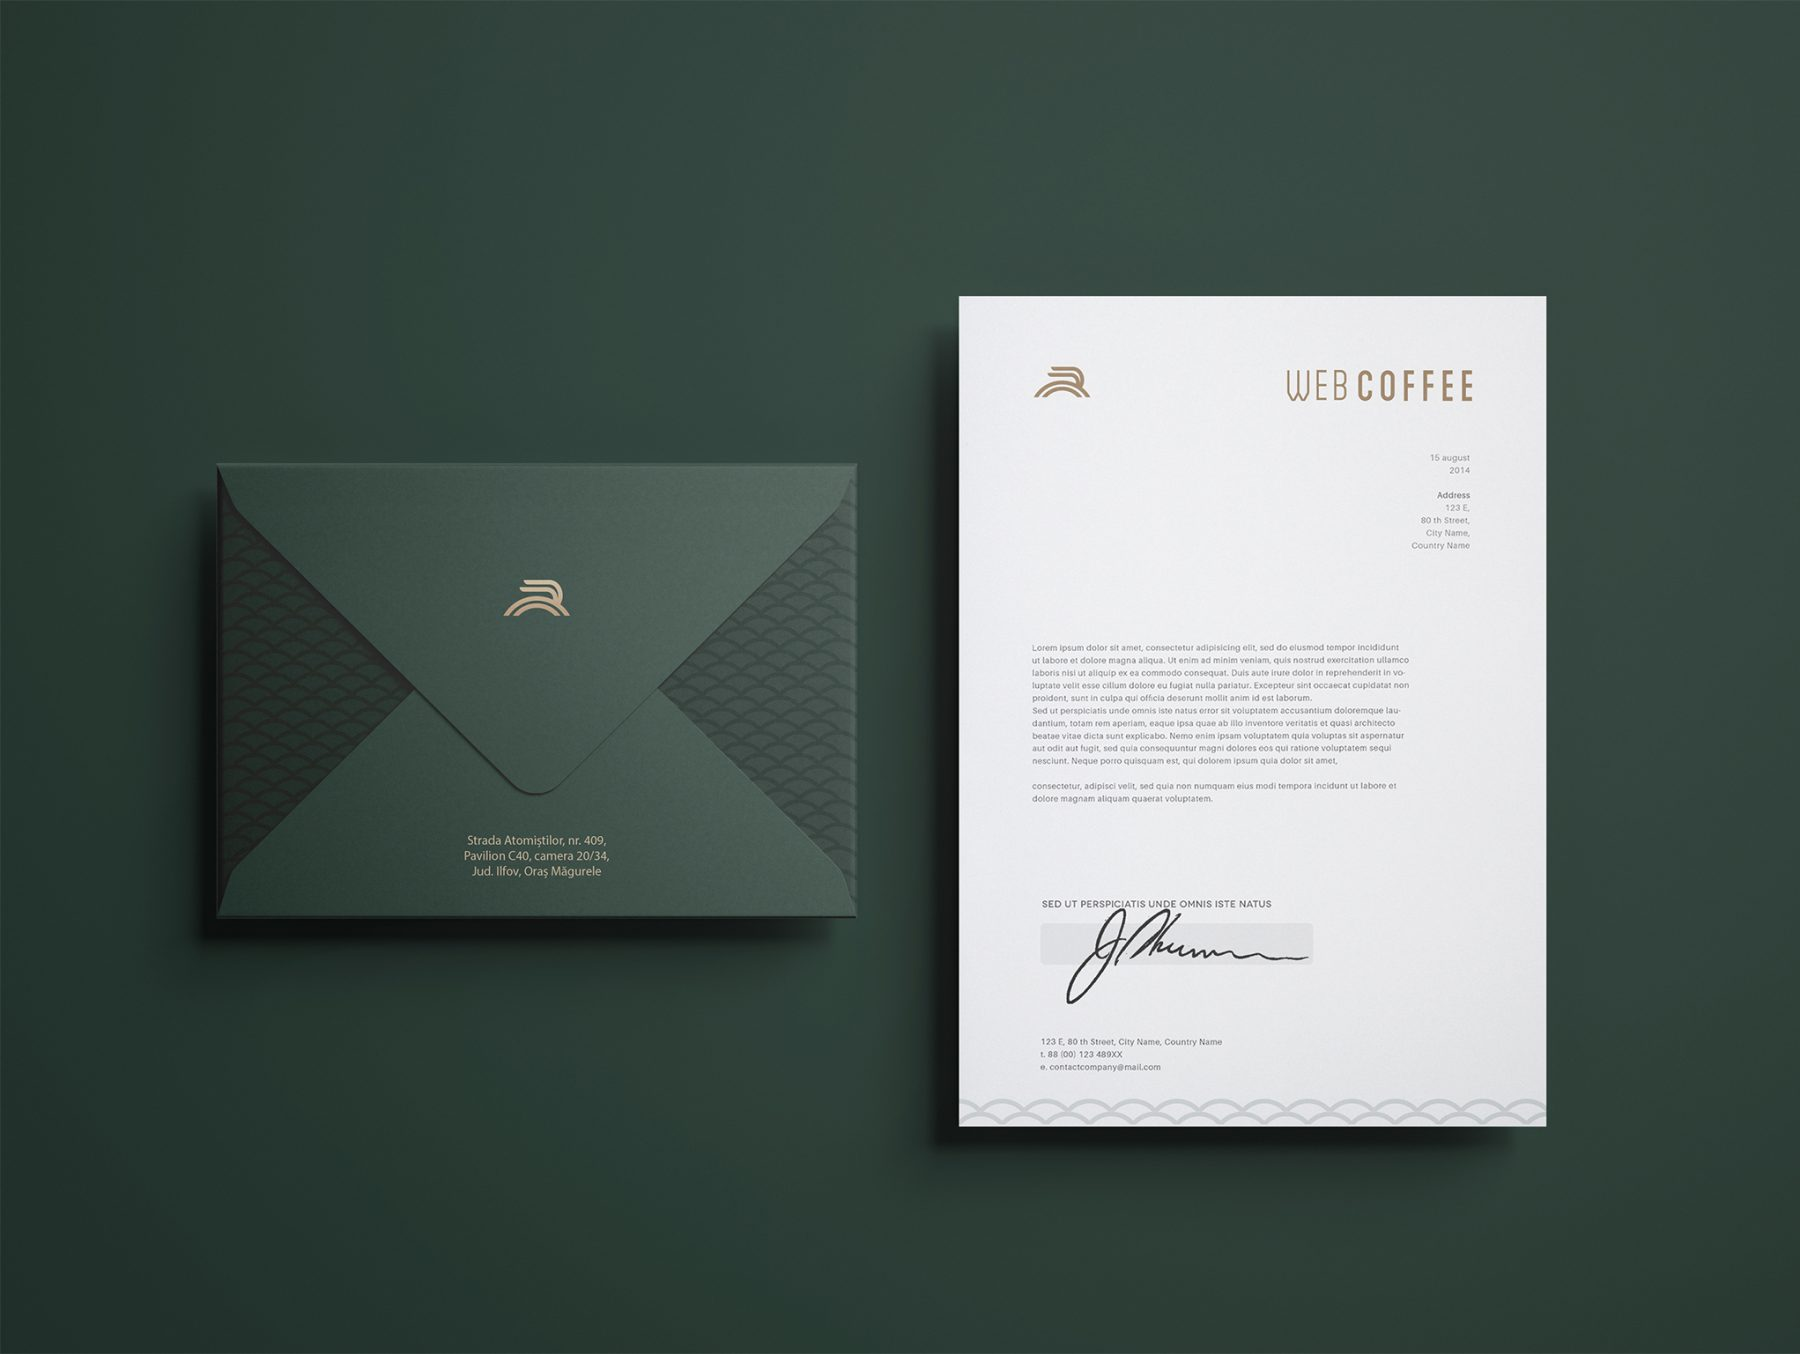 Web Coffee Envelope Design